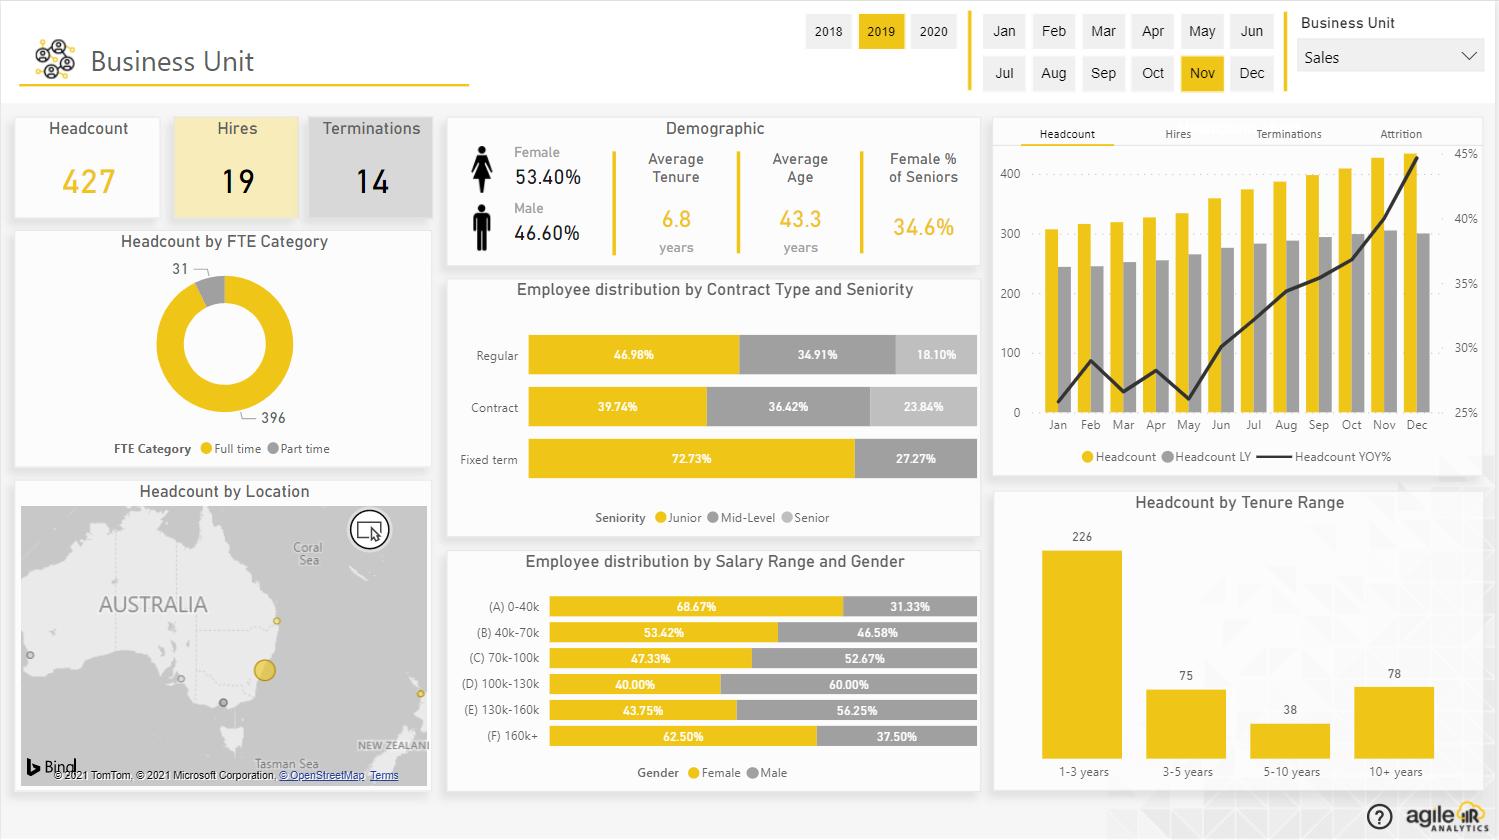 Agile HR Analytics - Business Unit